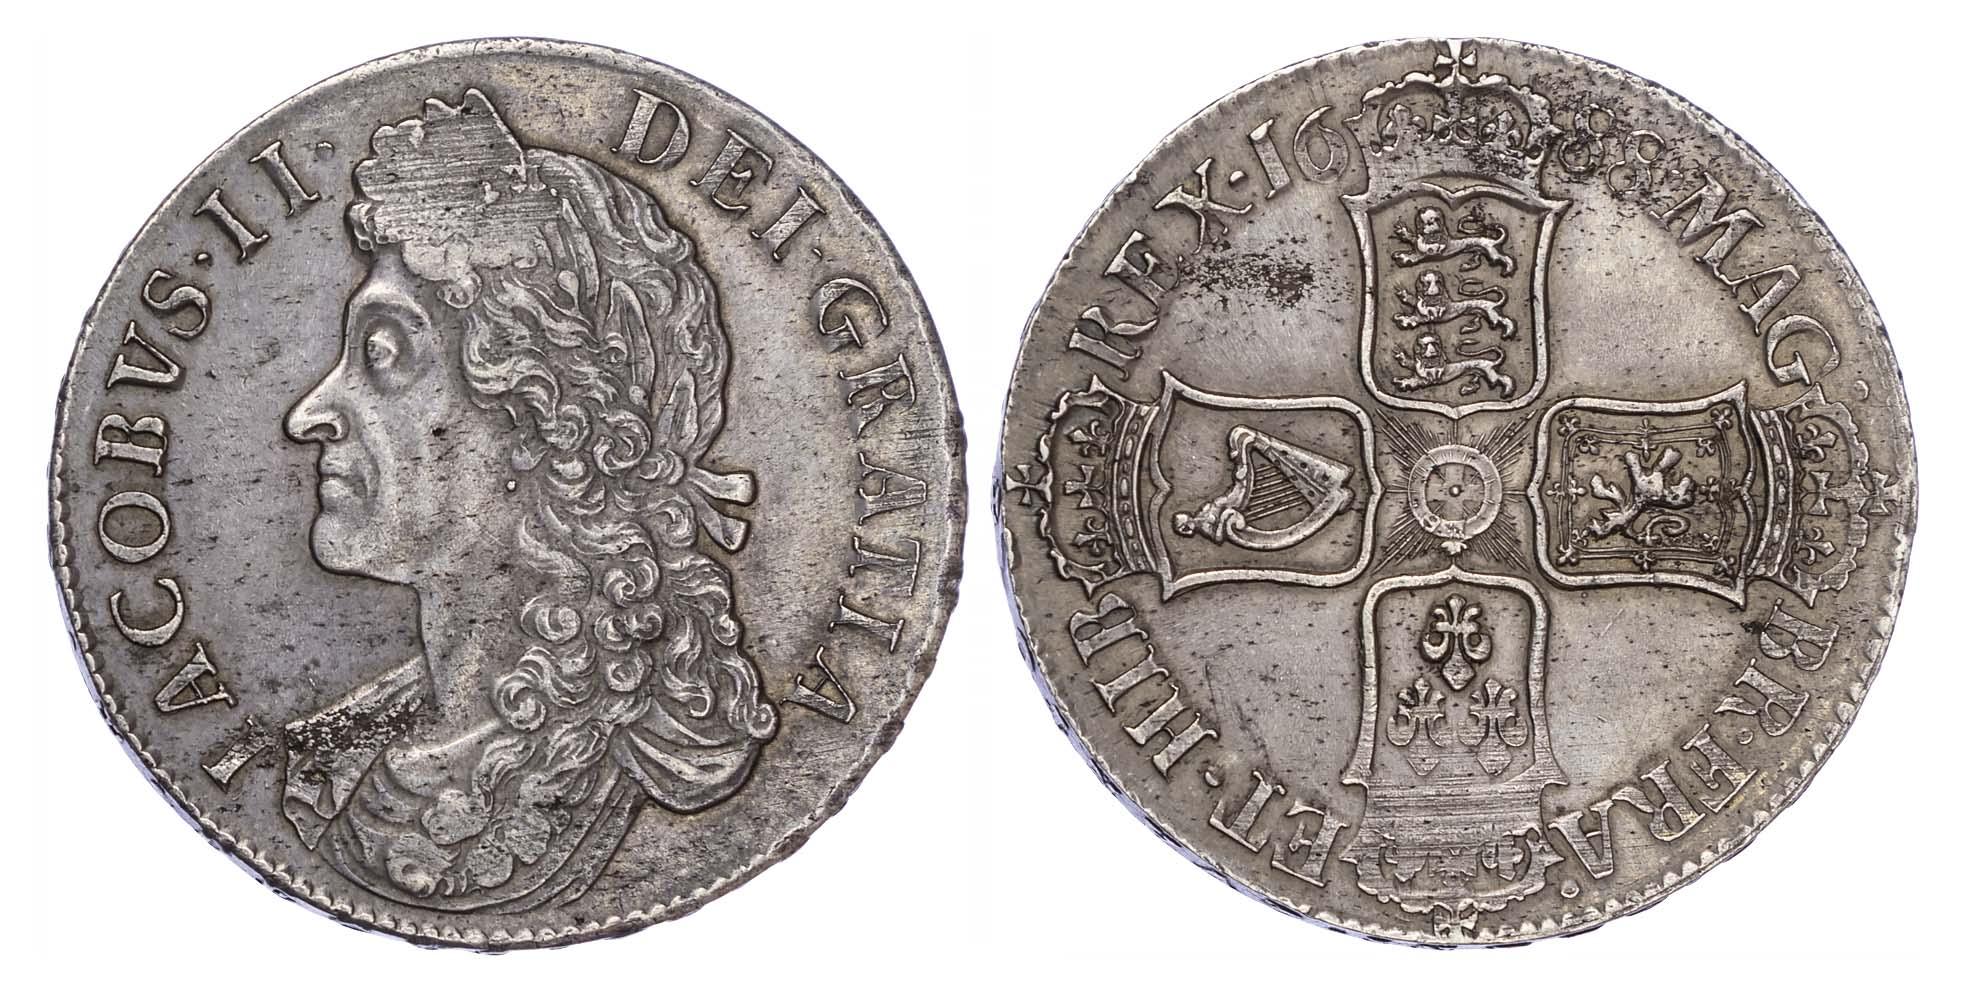 James II (1695-88), Crown, Second bust, 1688, Qvarto edge